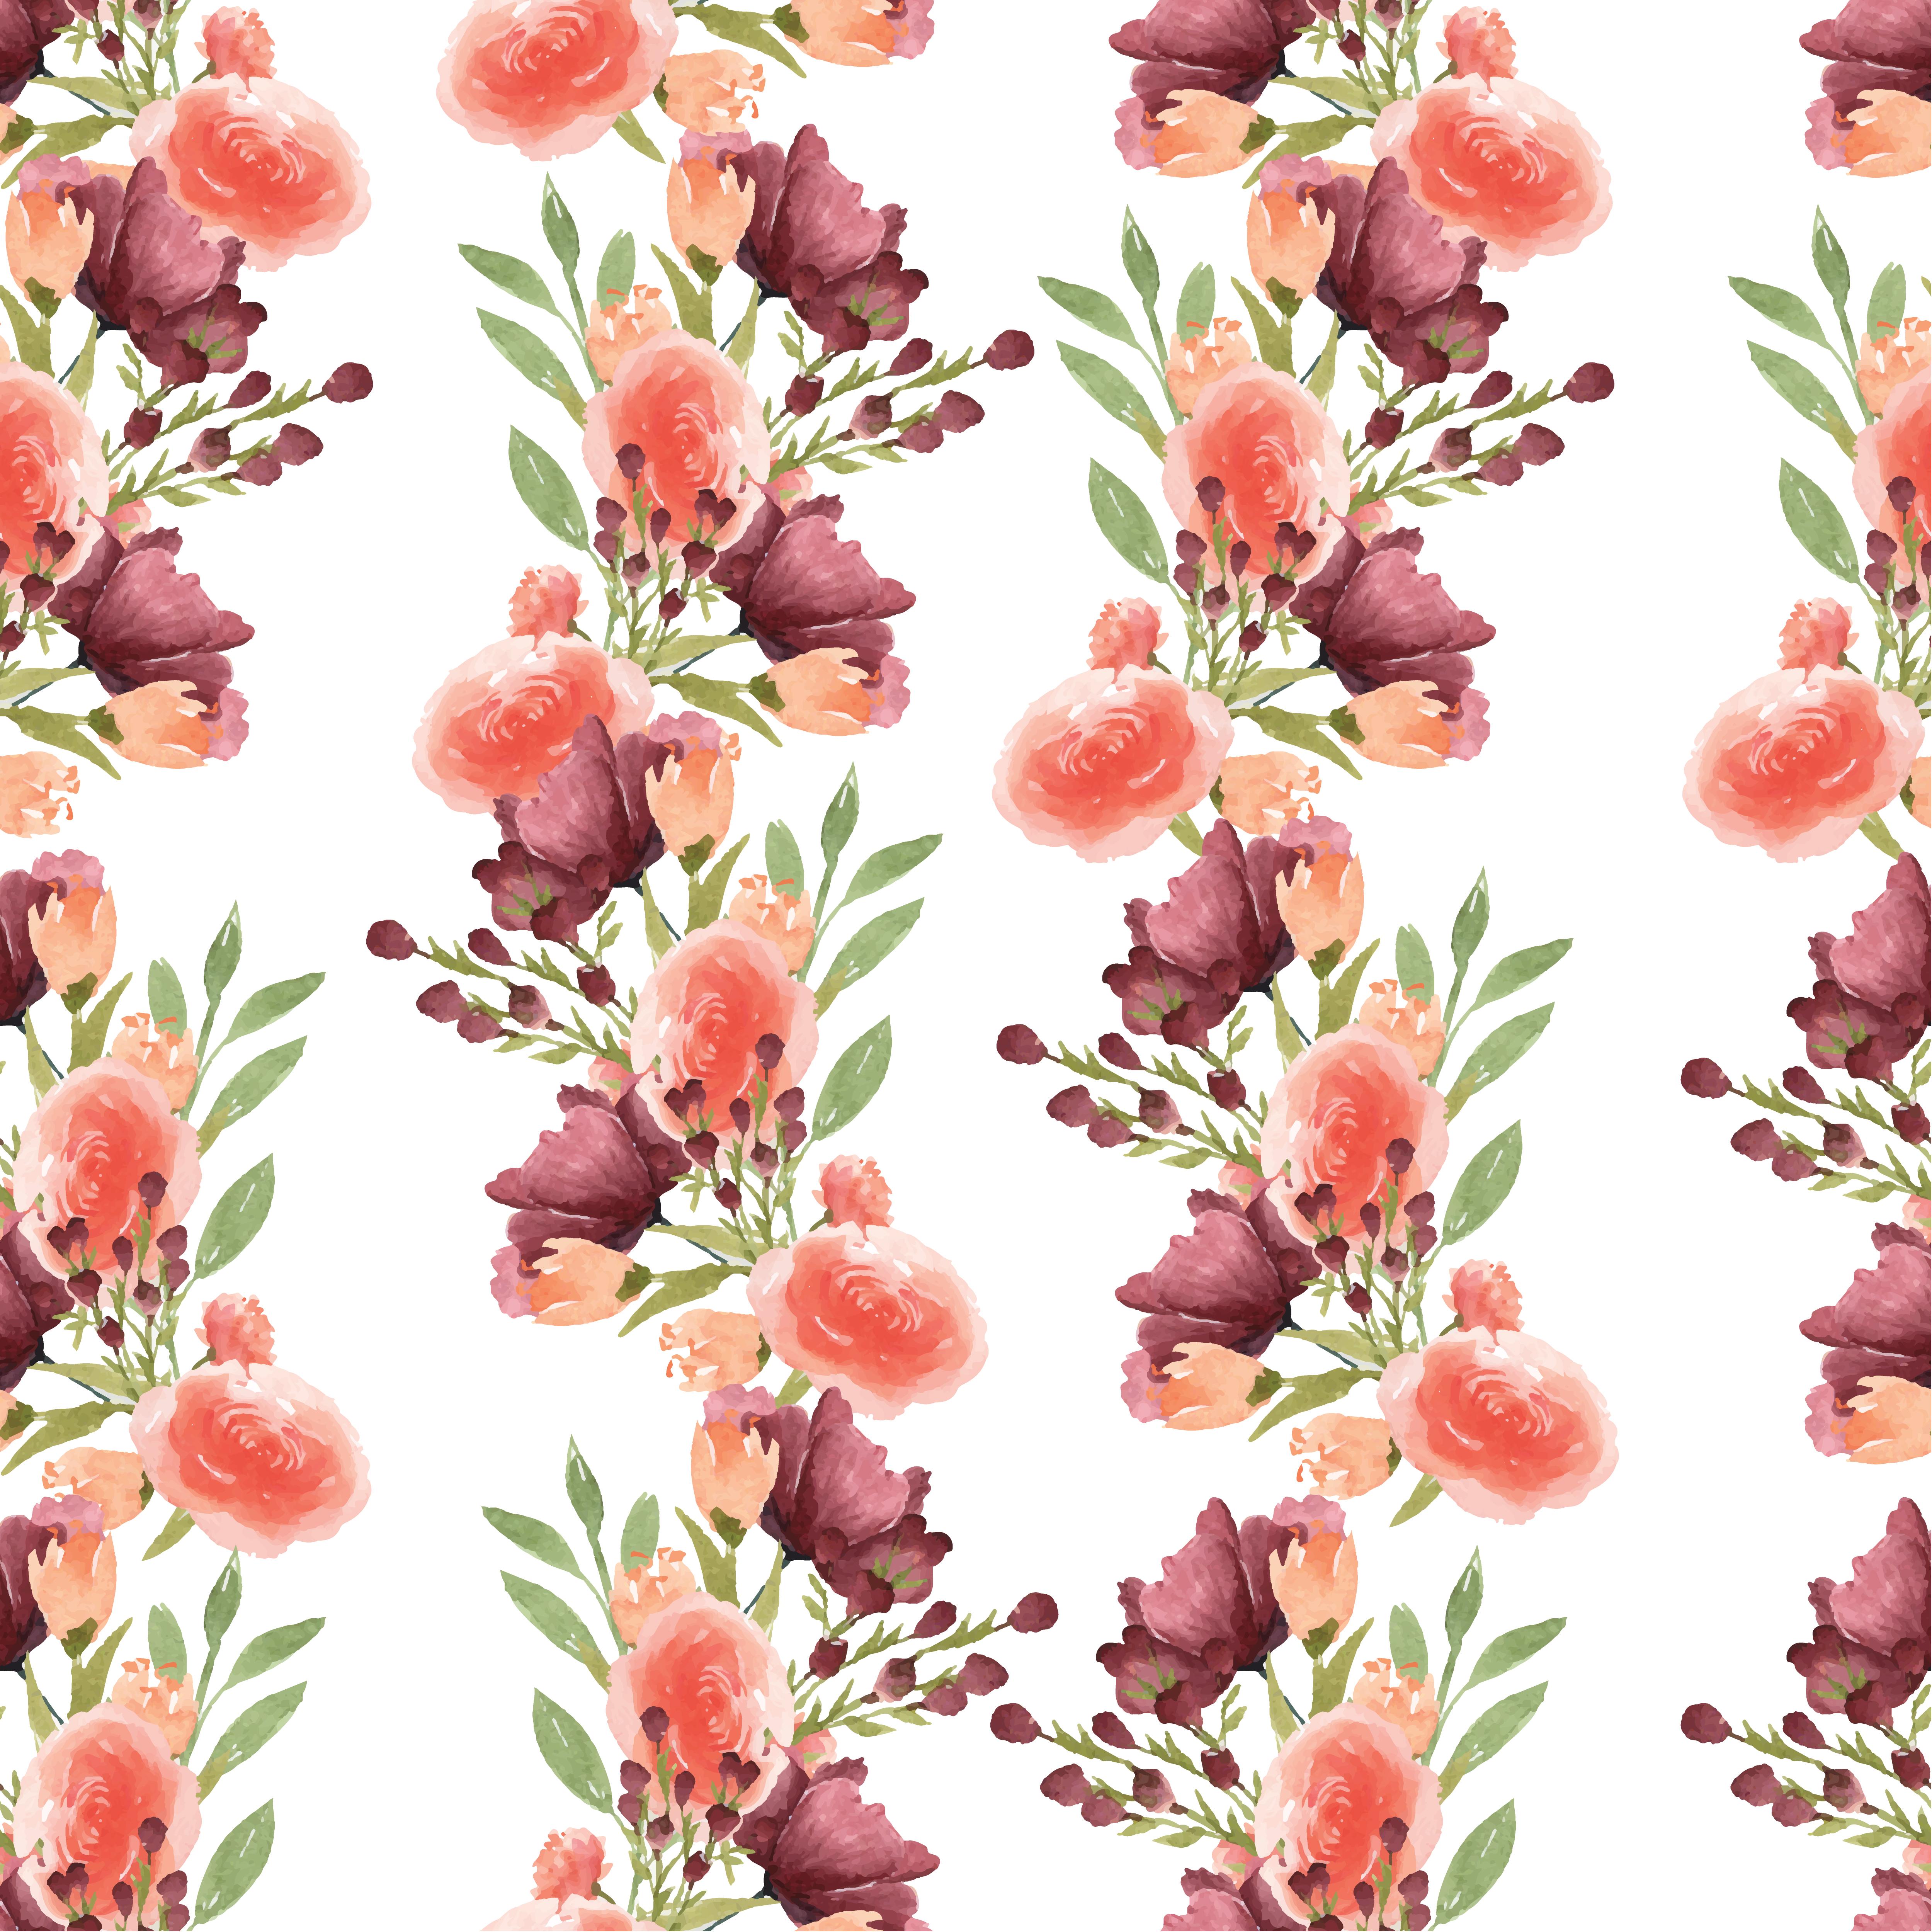 Pattern Seamless Floral Lush Watercolour Style Vintage